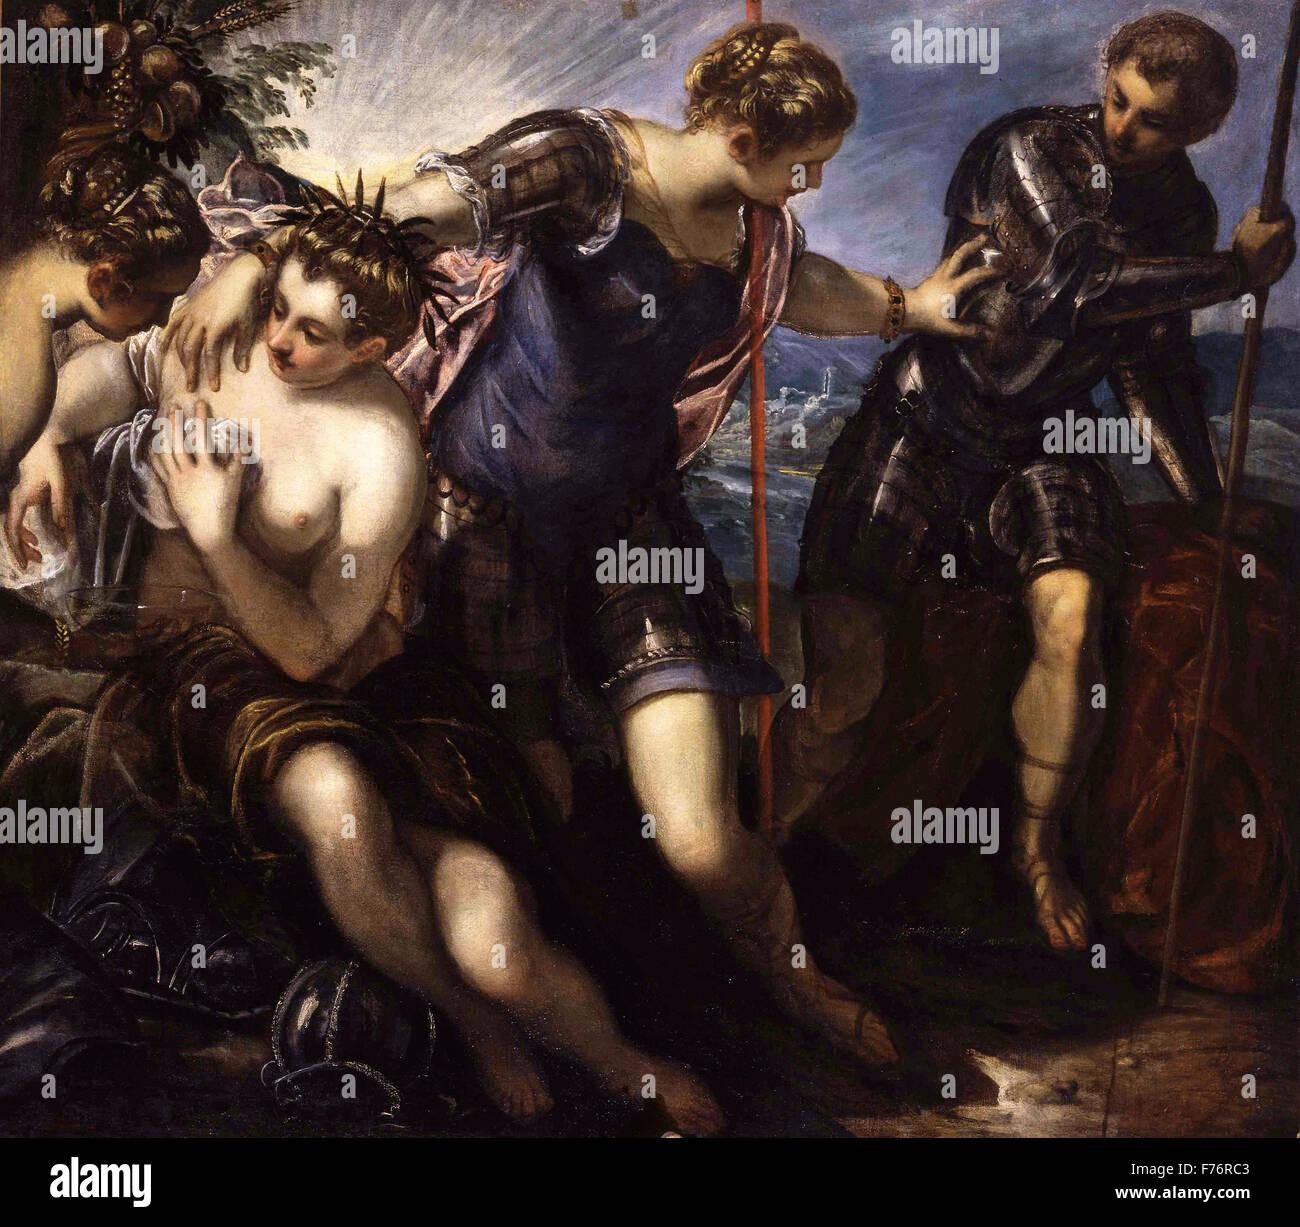 Jacopo Tintoretto - Minerva, Mars and Peace - Stock Image